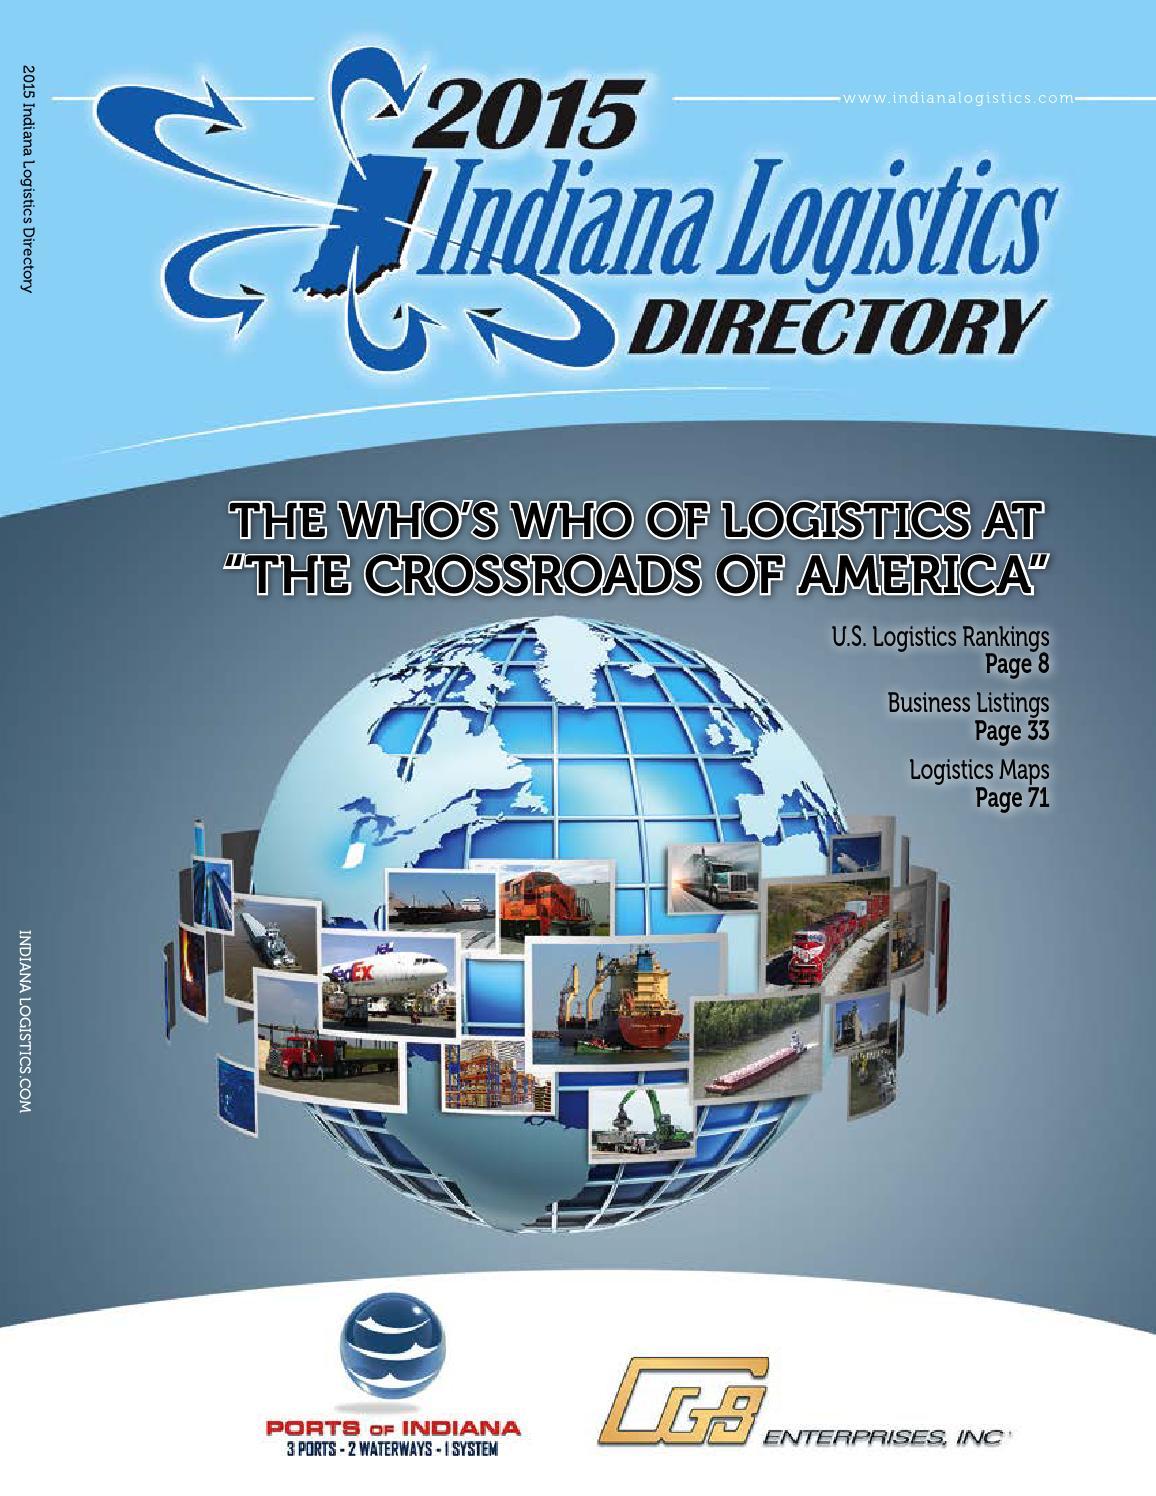 hazmat magazine winter by annex newcom lp issuu 2015 na logistics directory